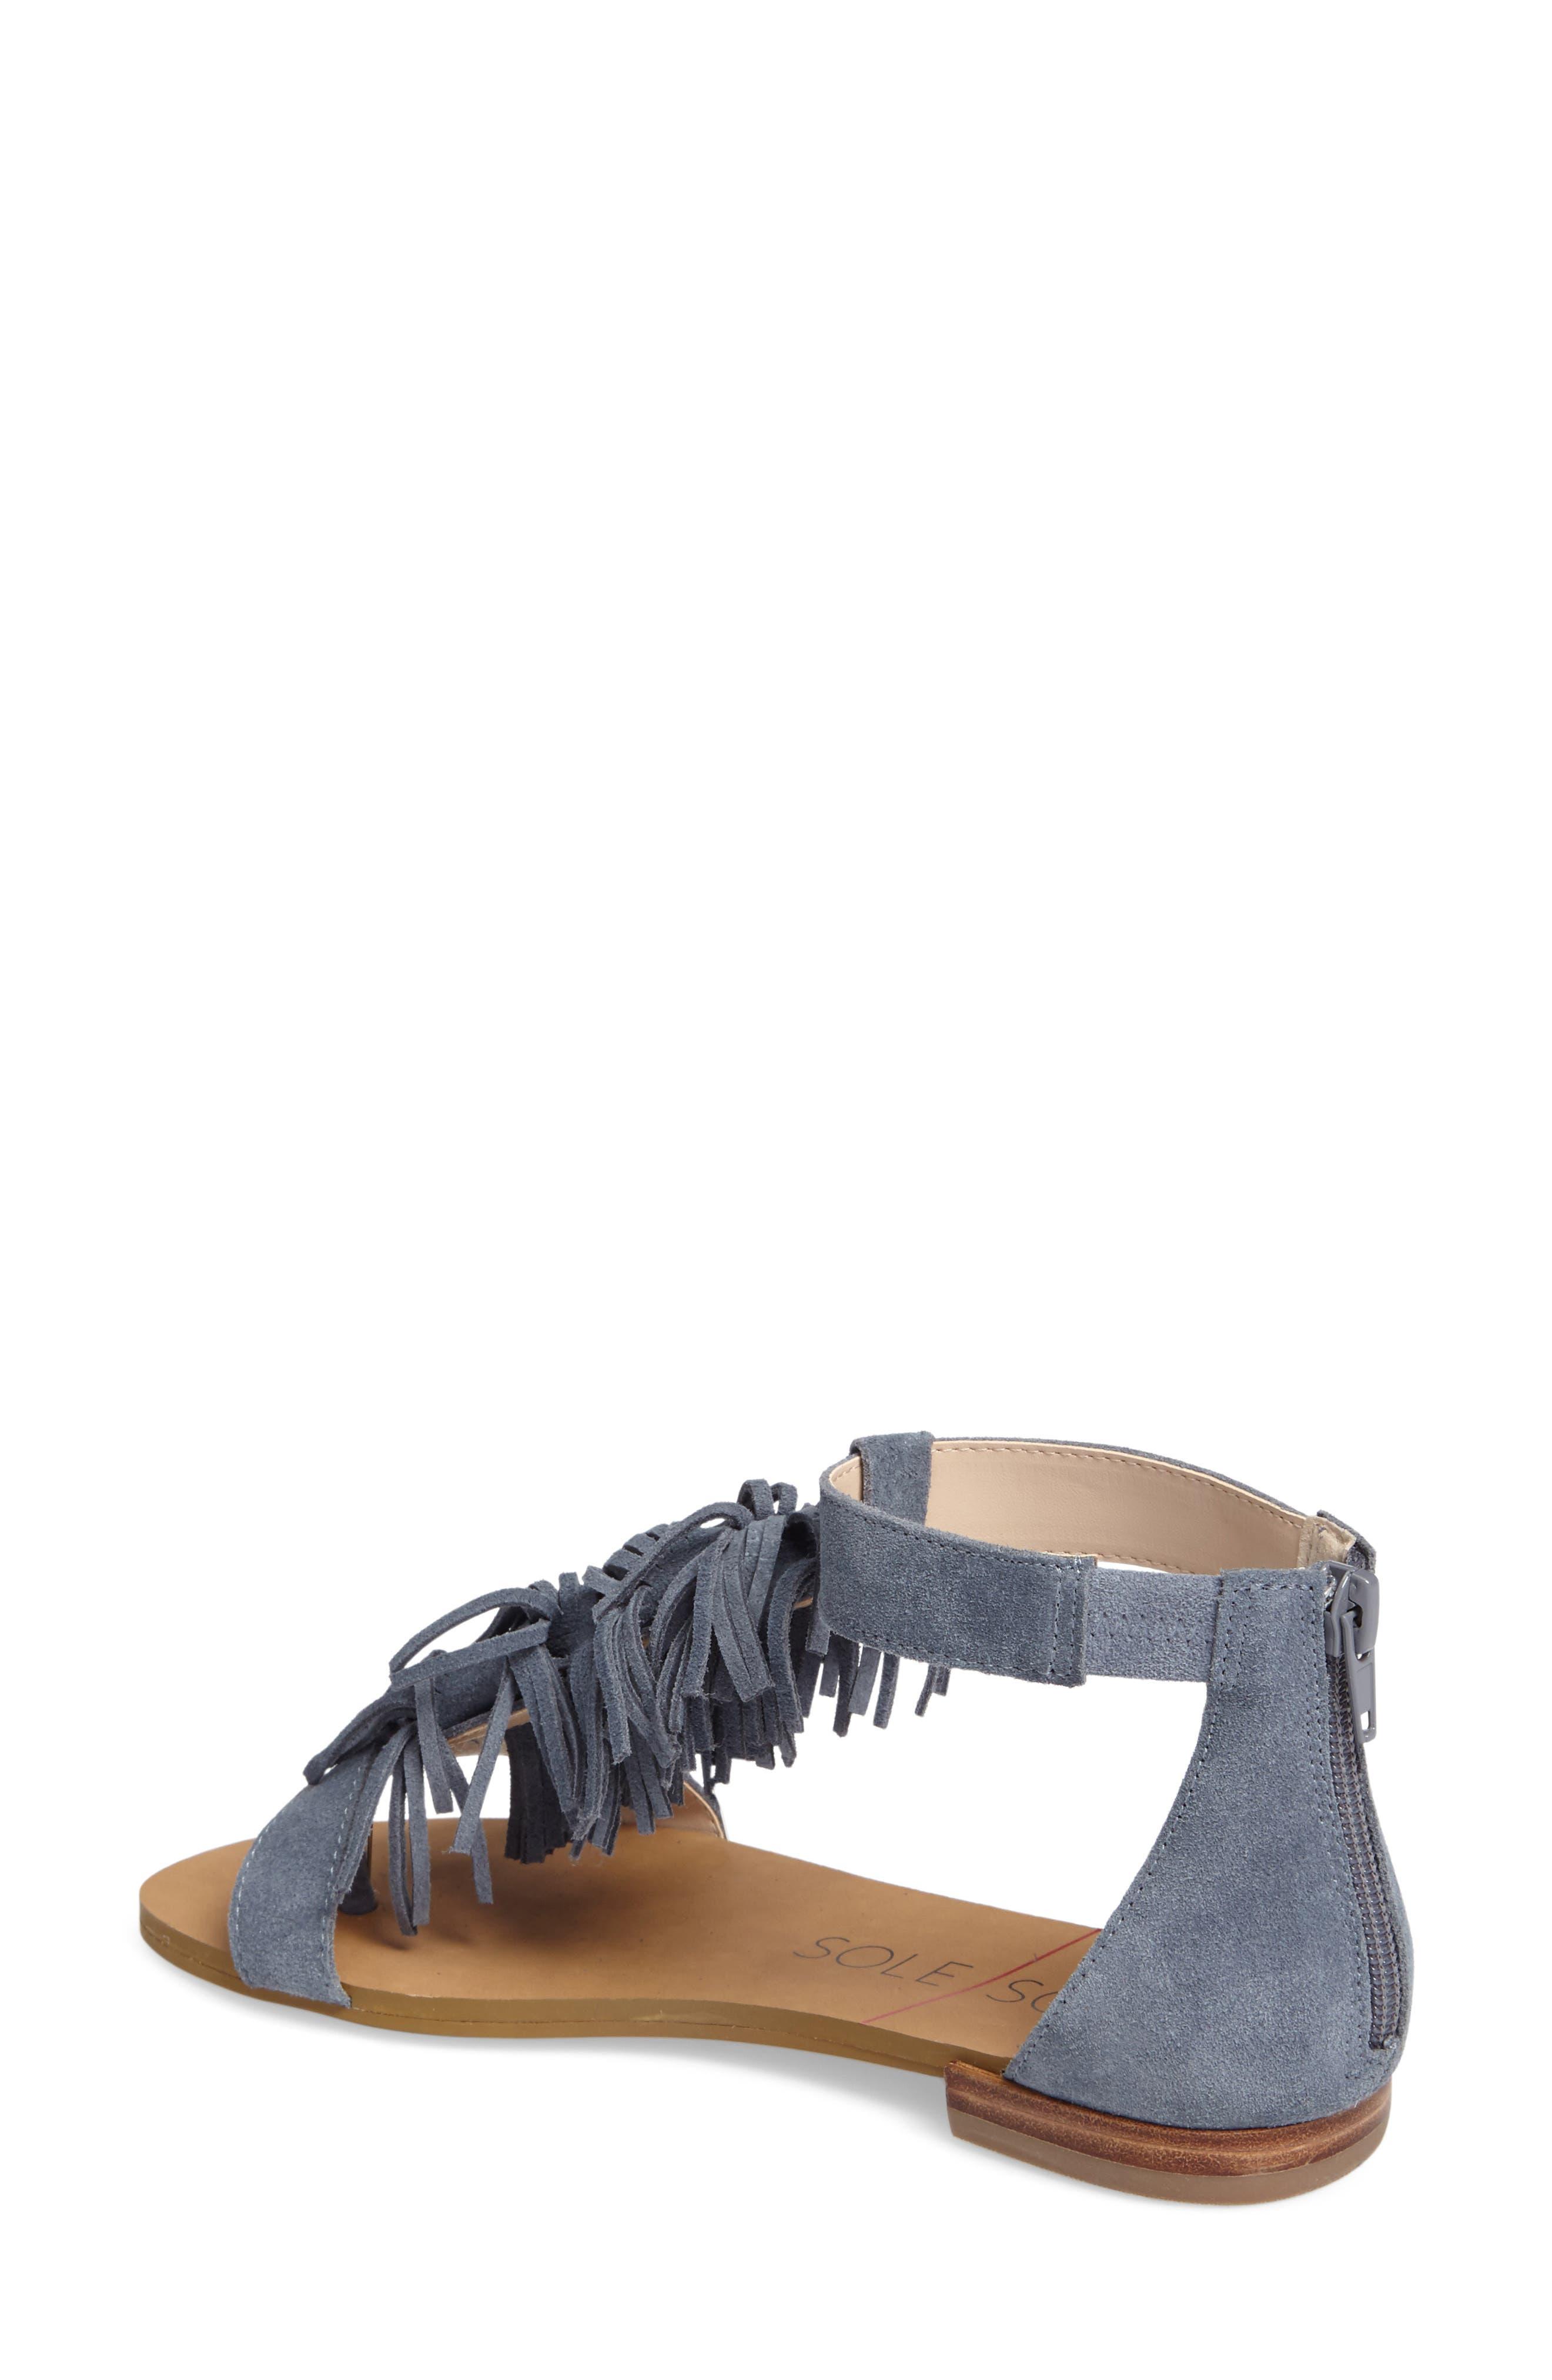 Alternate Image 2  - Sole Society Koa Fringed T-Strap Sandal (Women)